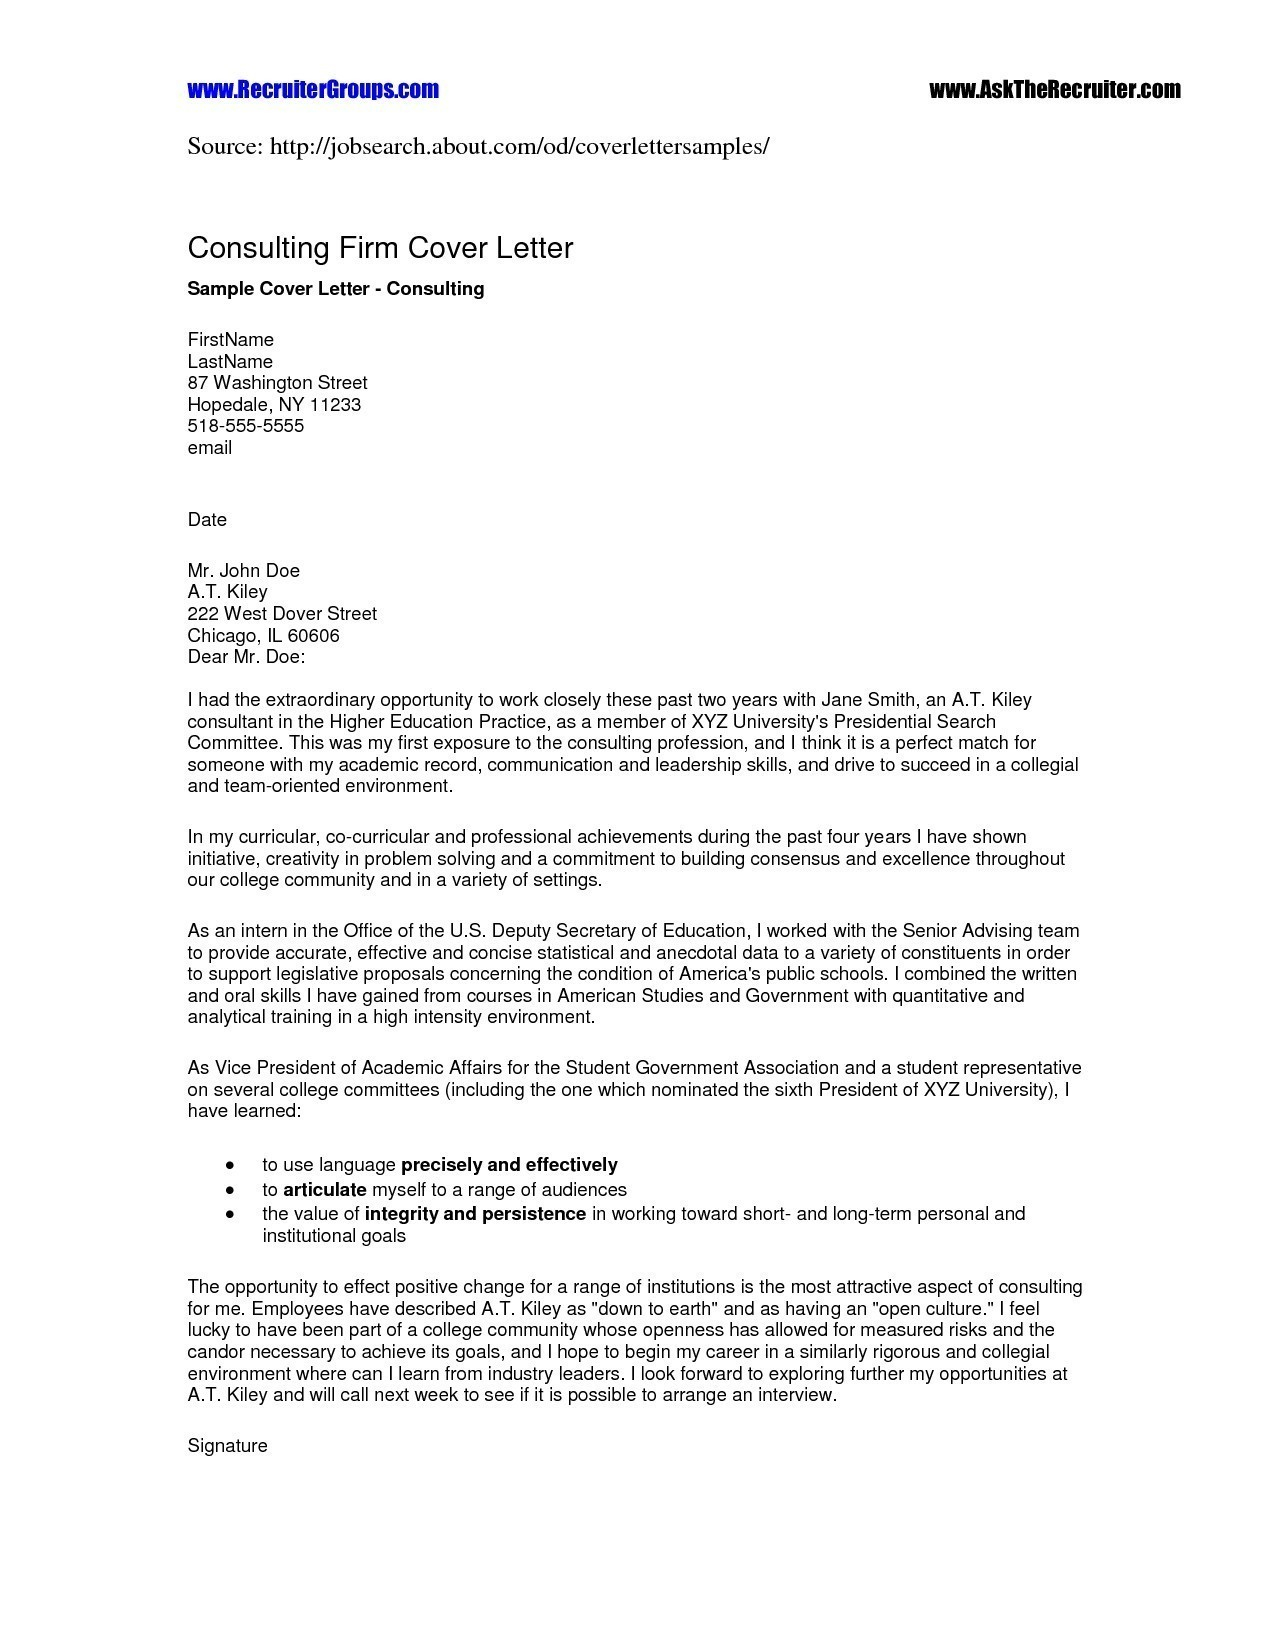 mla cover letter sample